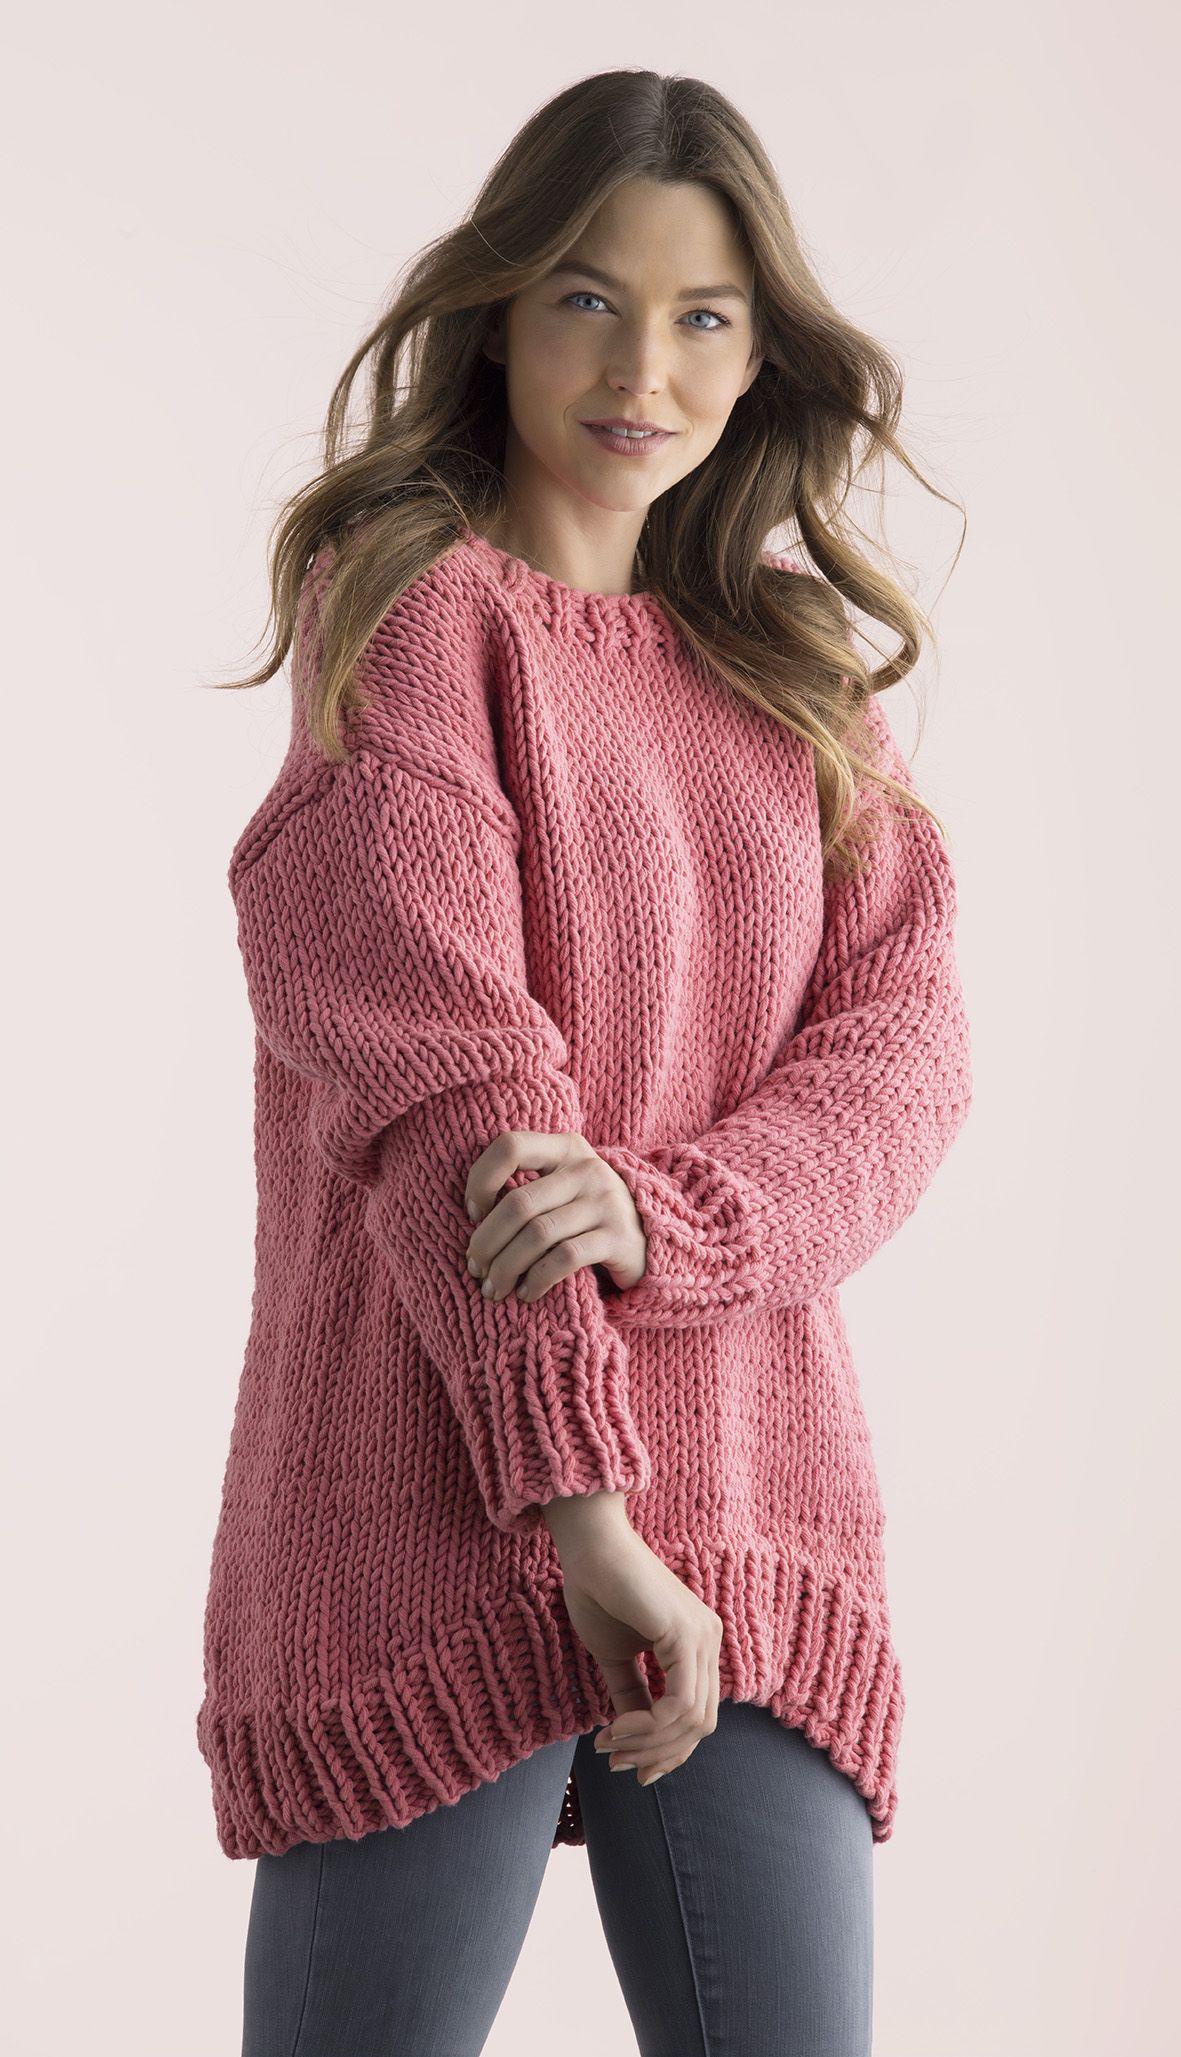 Chunky Knit jumper by Panda Australia   Jumper knitting ...